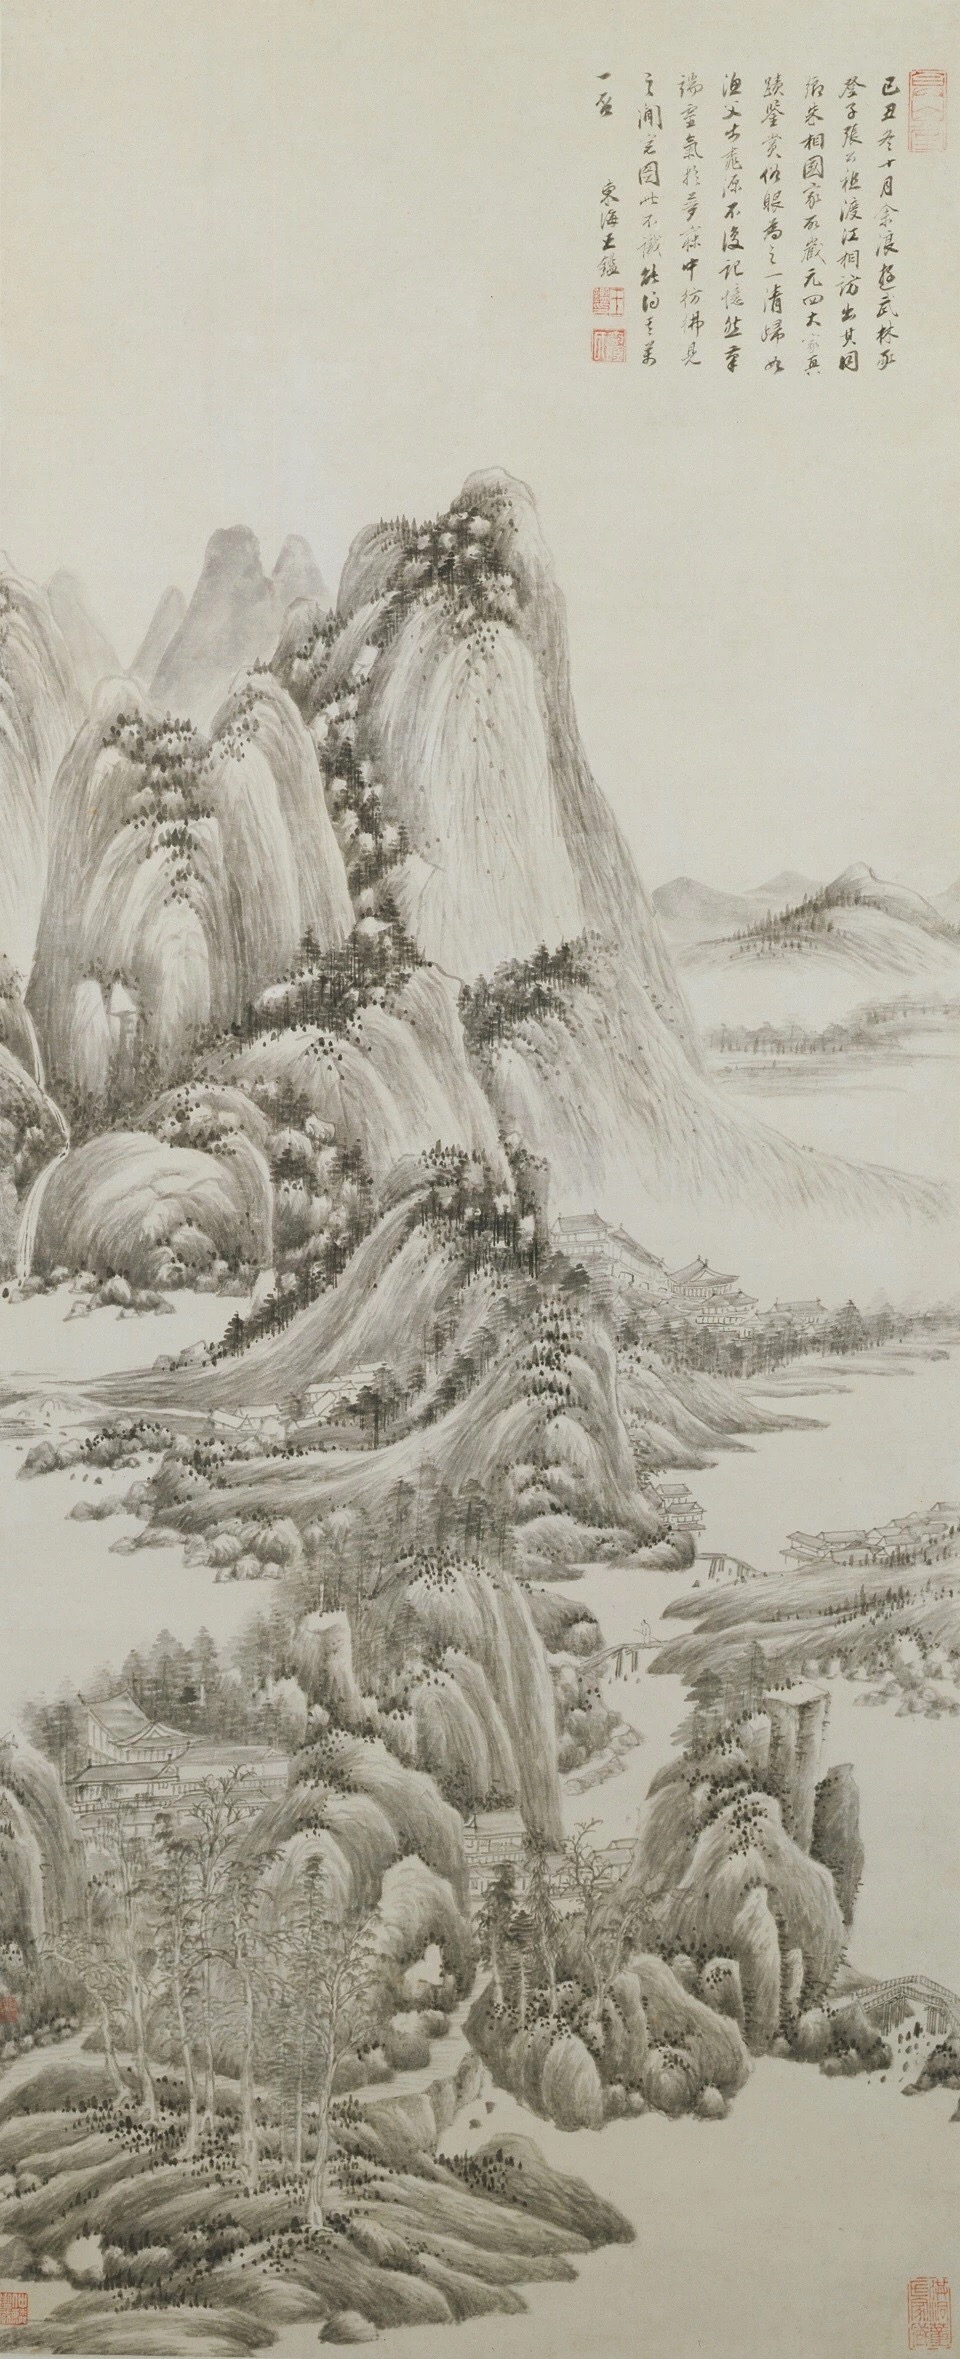 Wang Jian: After the Spirit of the Four Yuan Masters